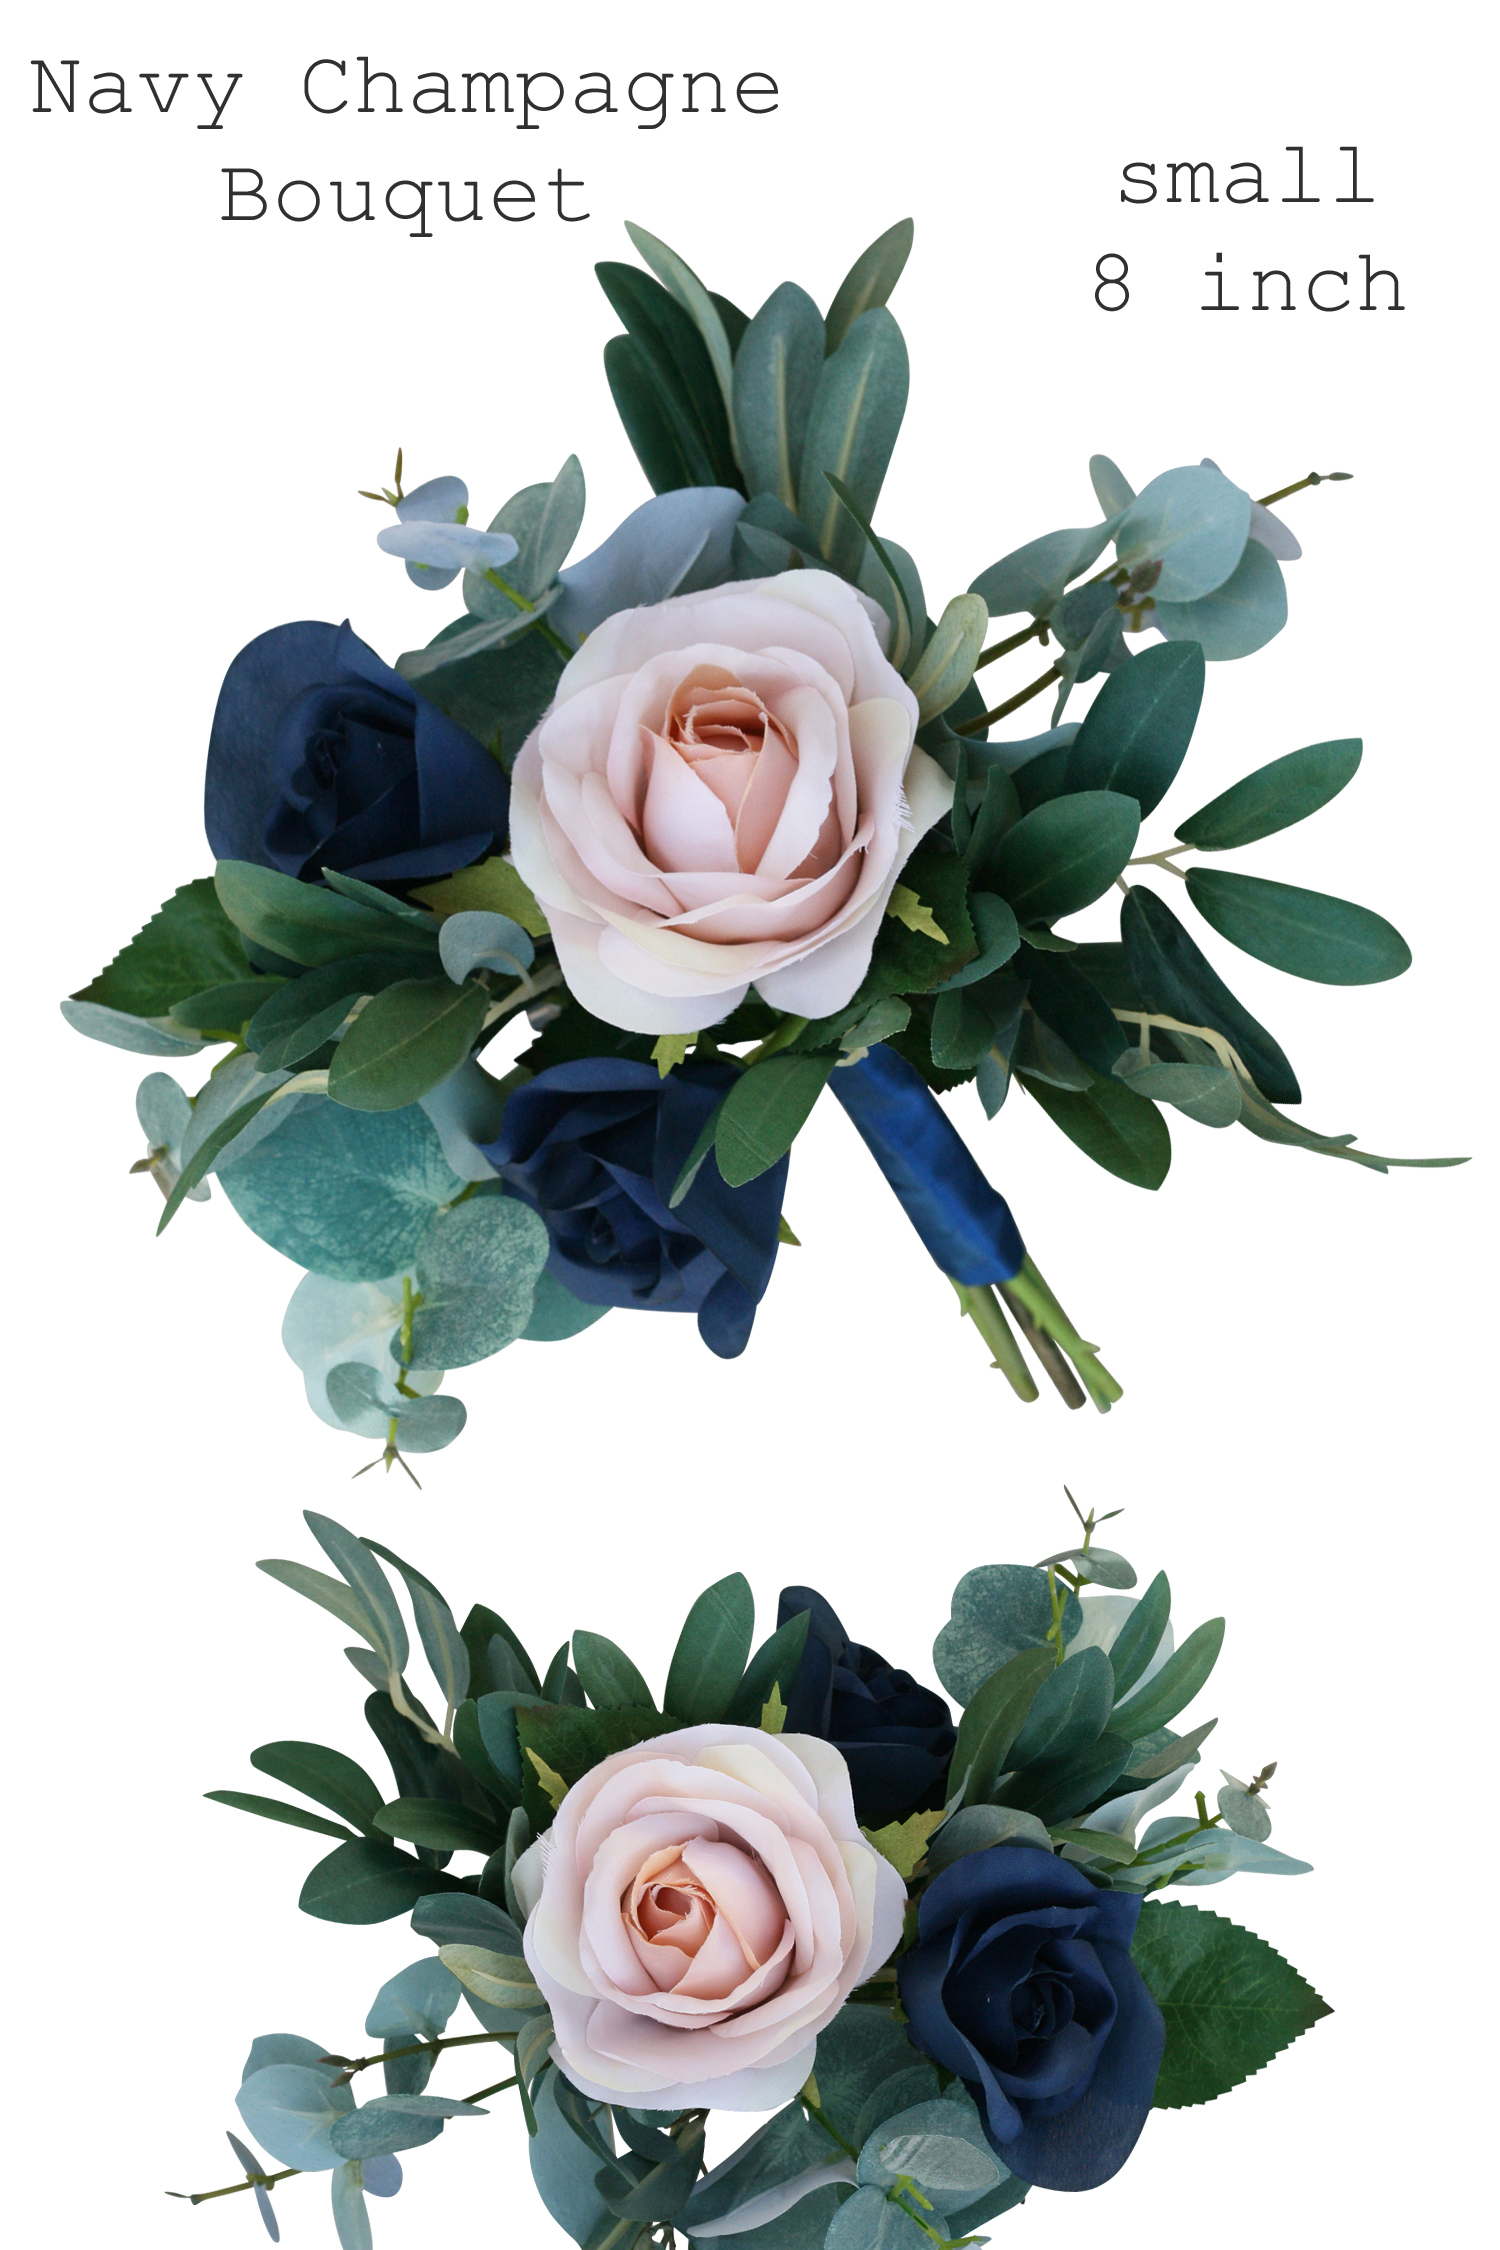 navy-champagne-small-silk-wedding-bouquet.jpg